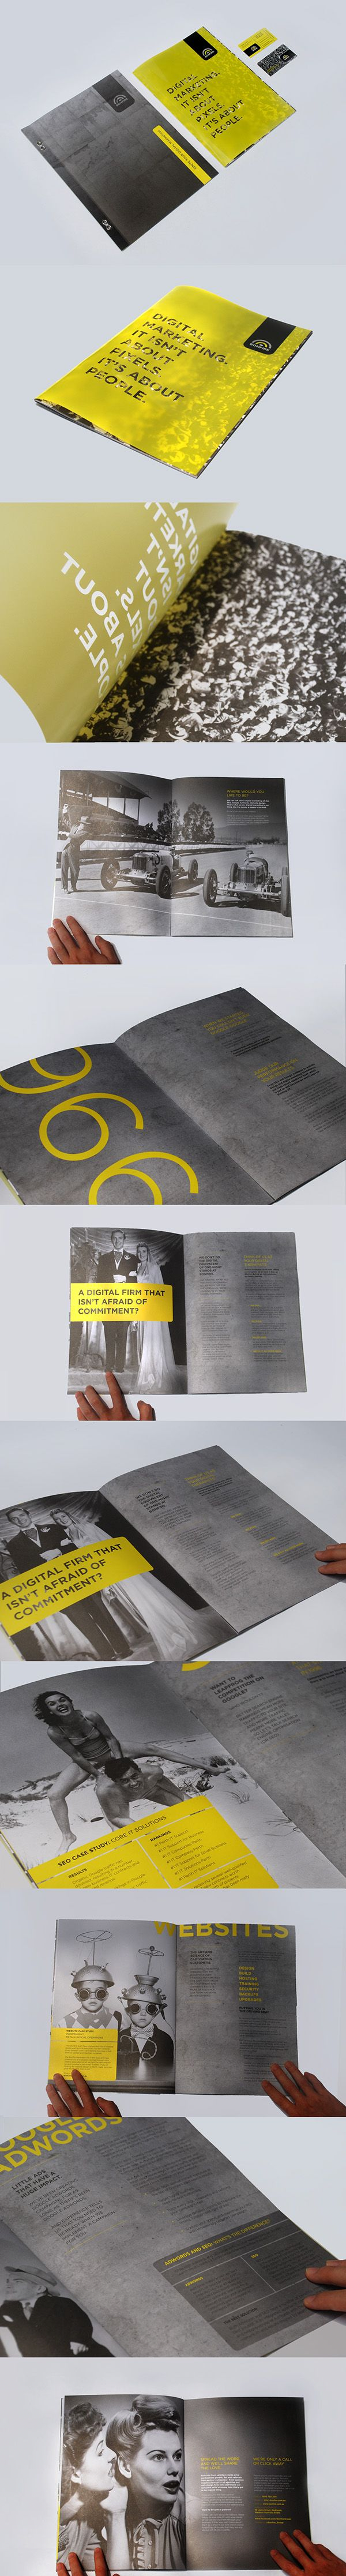 Introducing Moire Studios a thriving website and graphic design studio.Or visit our website www.moirestudiosjkt.com